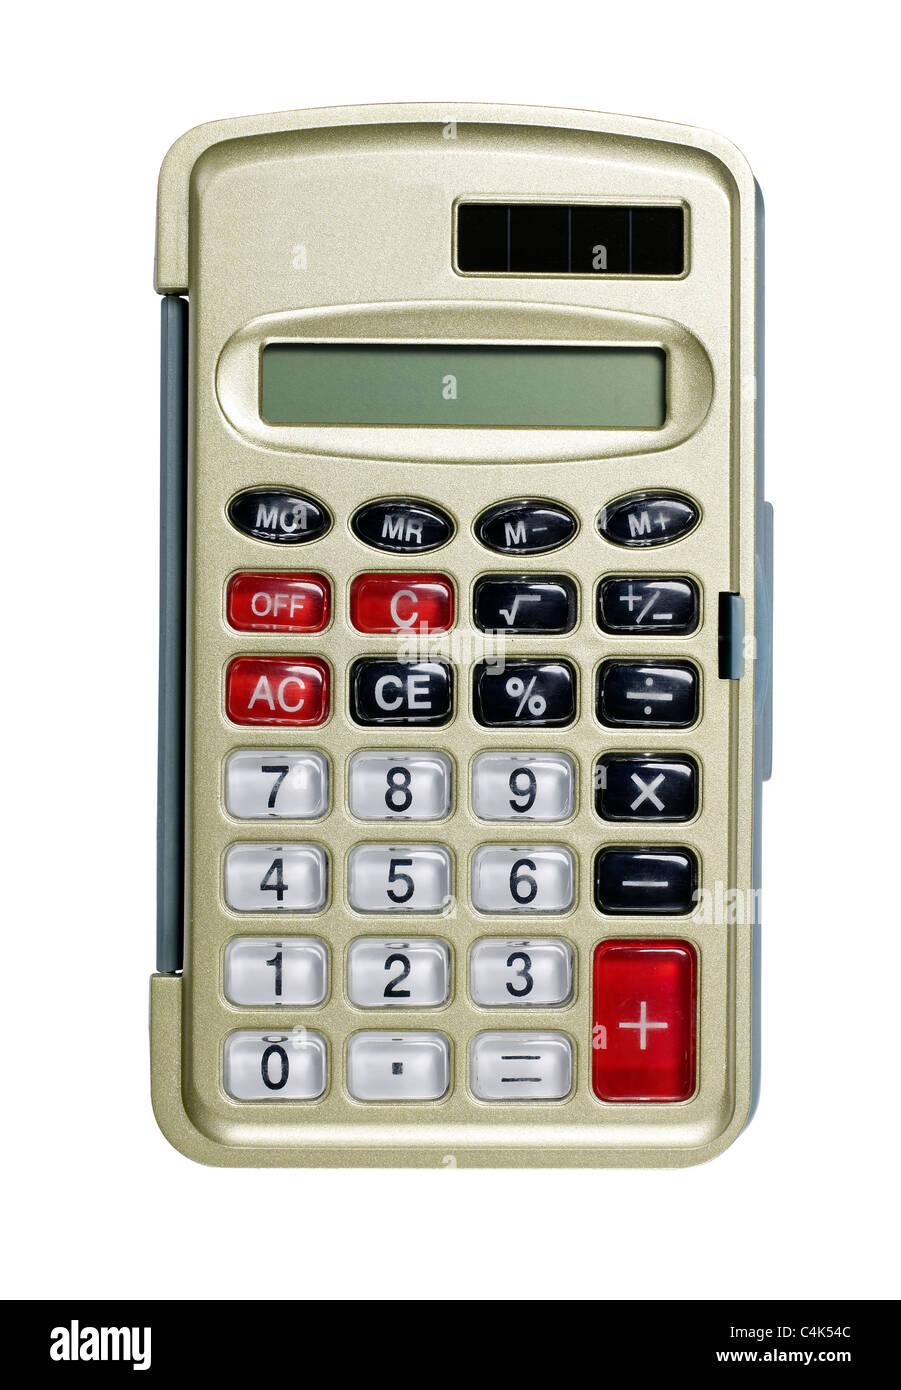 Calculator - Stock Image